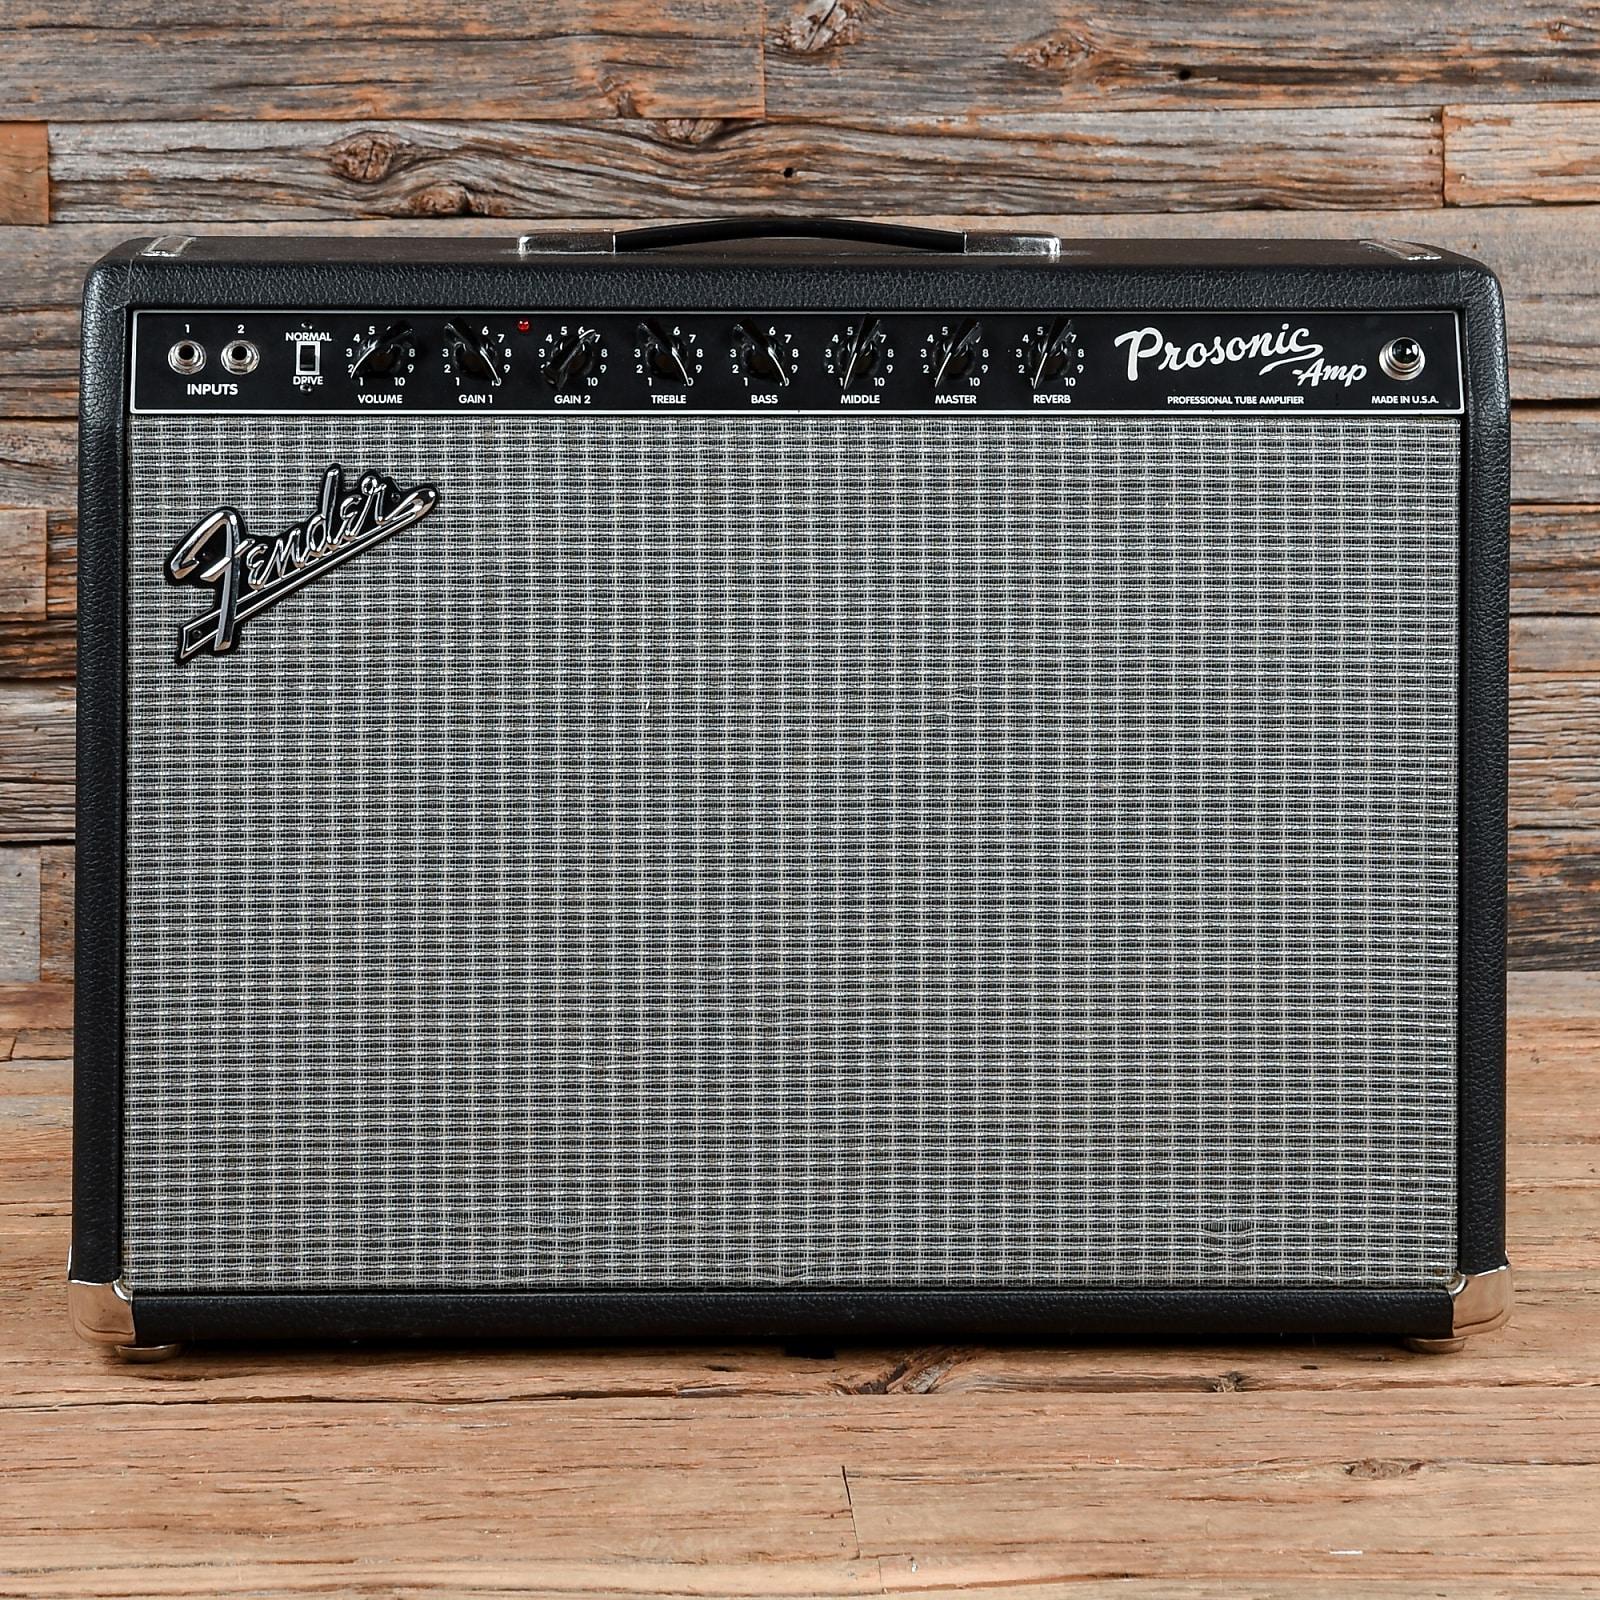 Fender Prosonic Amp 60w 2x10 Combo 1990s S841 Bass Amplifier